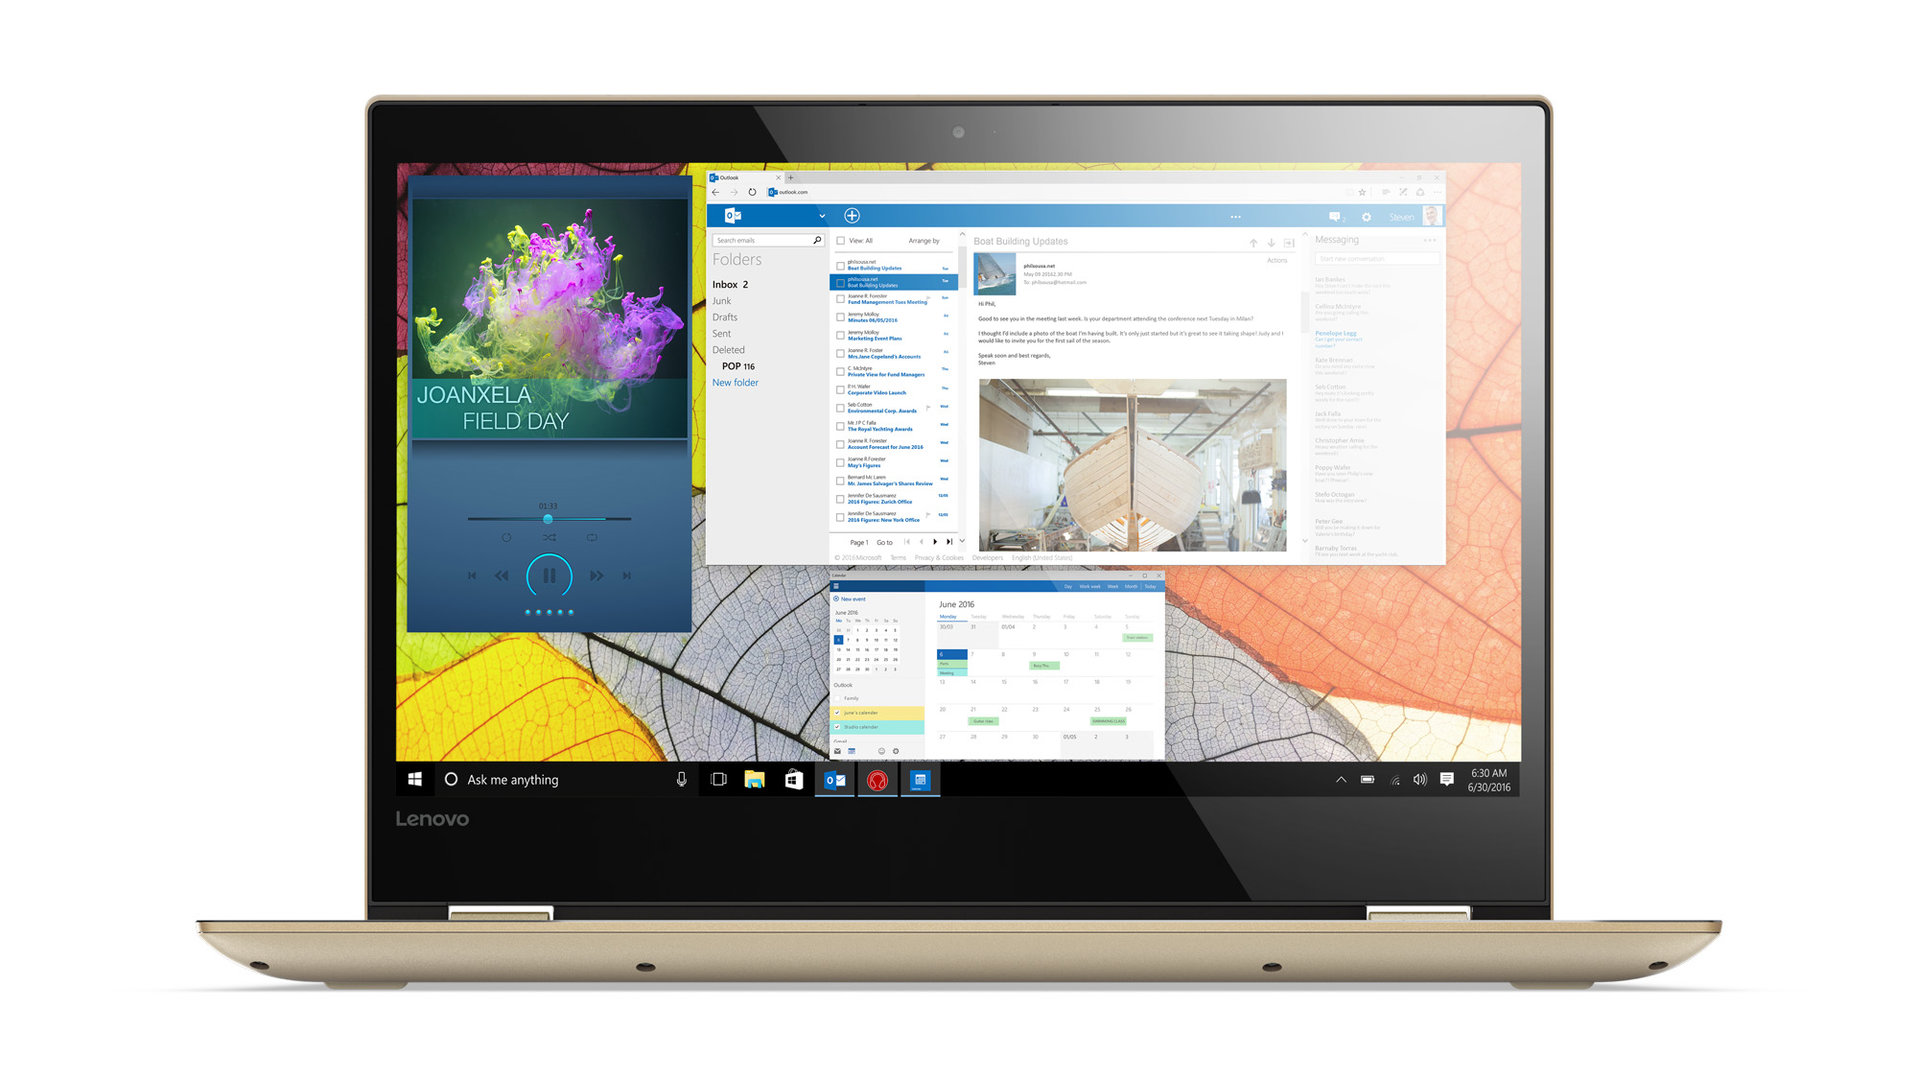 Lenovo Yoga 520 (14 Zoll) in Gold